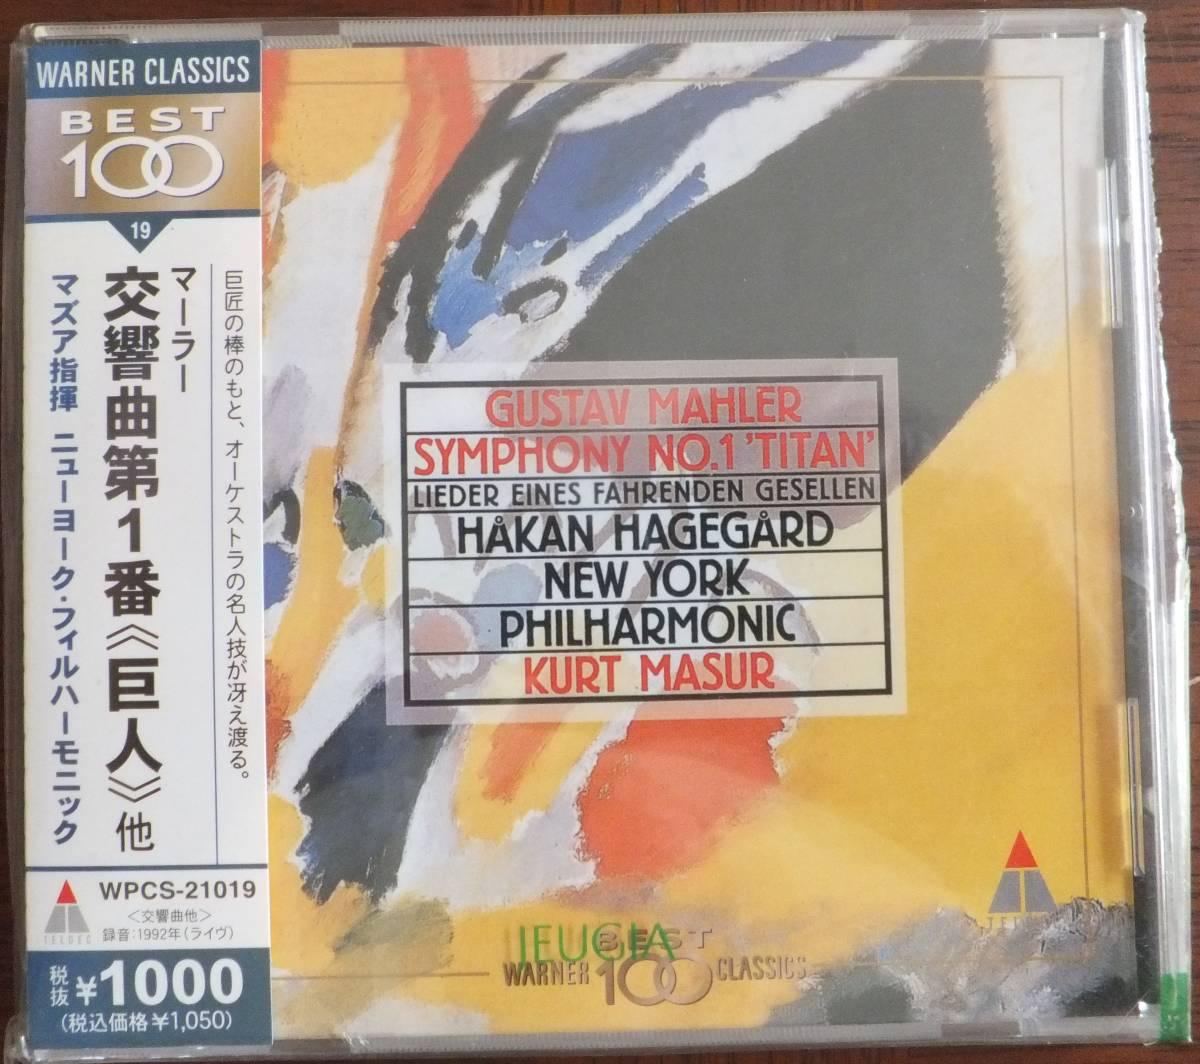 CD マーラー 交響曲第1番「巨人」/歌曲集「さすらう若人の歌」クルト・アズマ指揮 ニューヨーク・フィルハーモニー管弦楽団_画像1